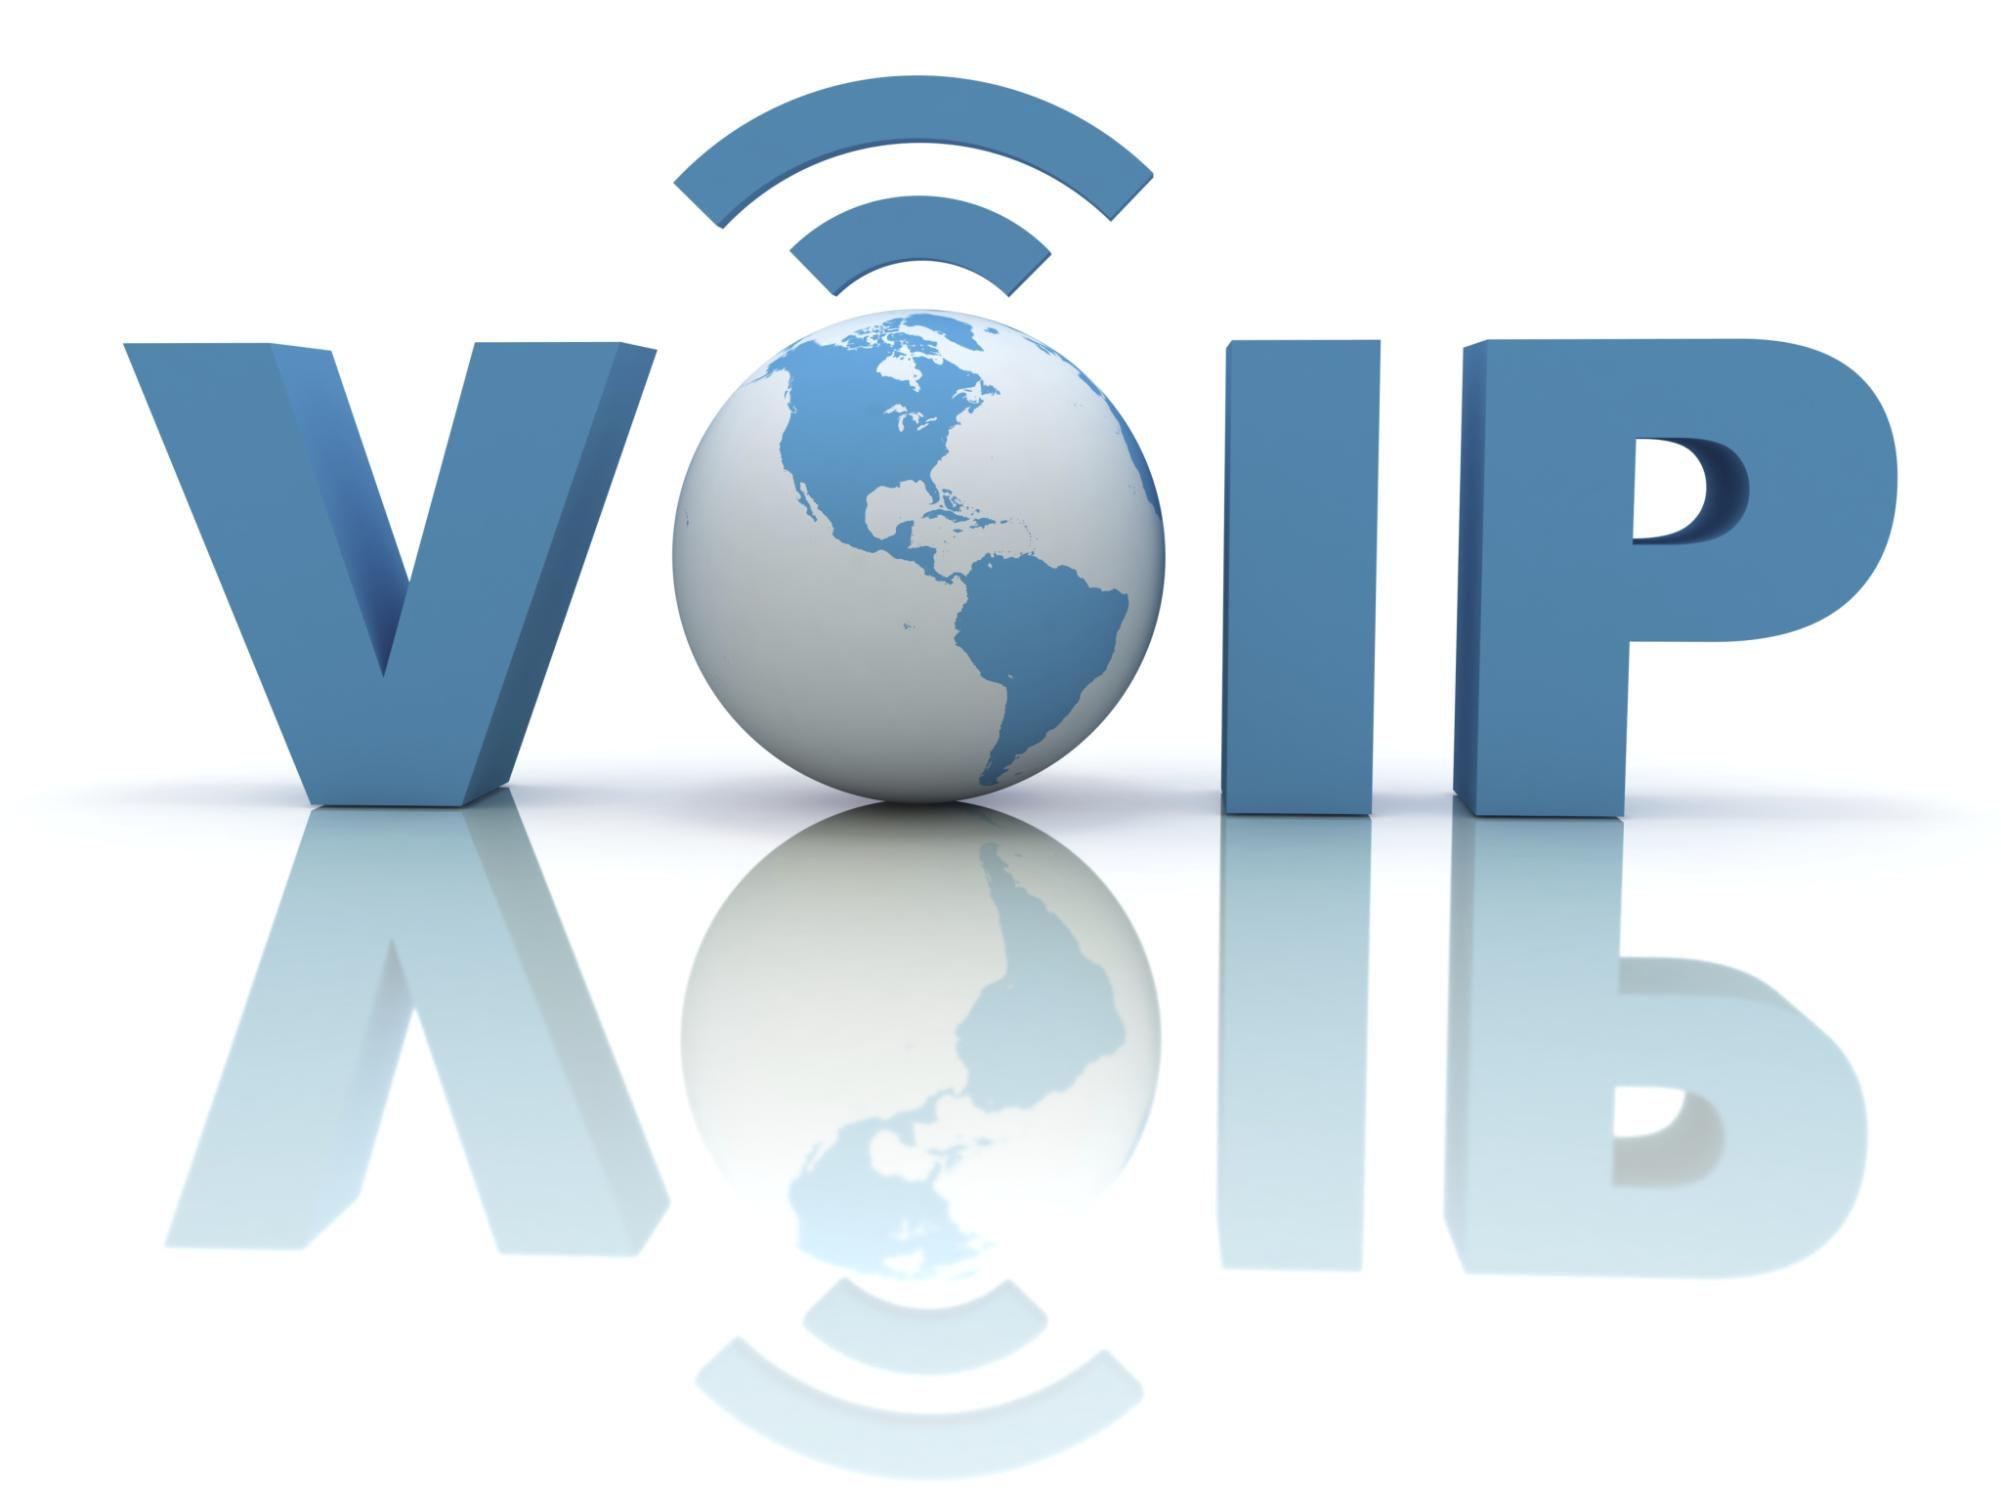 What is voip and how you - What Is Voip And How You 18